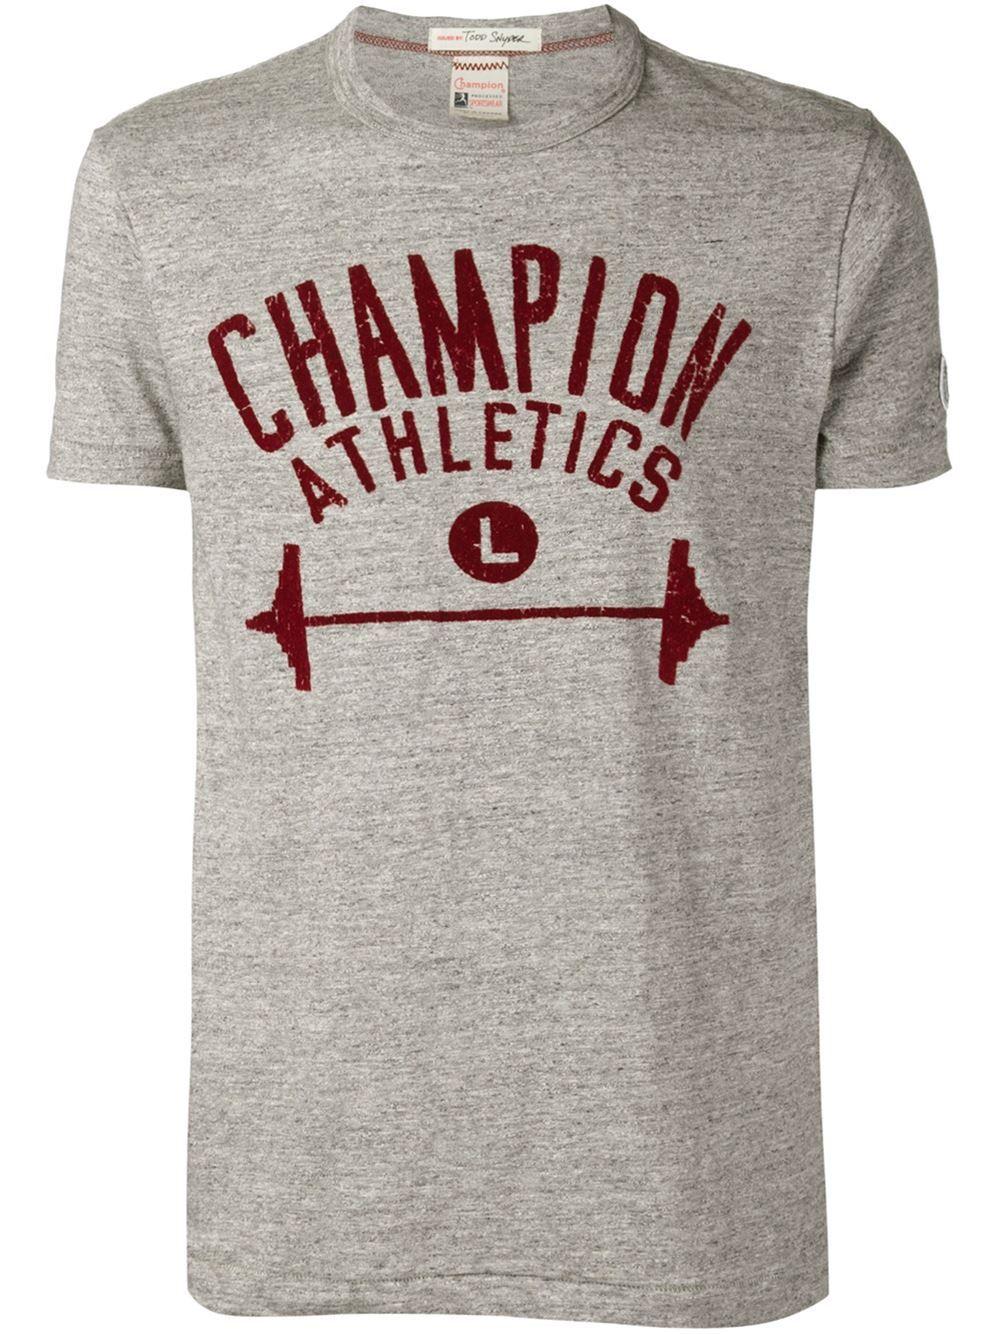 7b4c42c3e8772 Champion Todd Snyder X Champion Logo Print T-shirt - The Webster - Farfetch .com